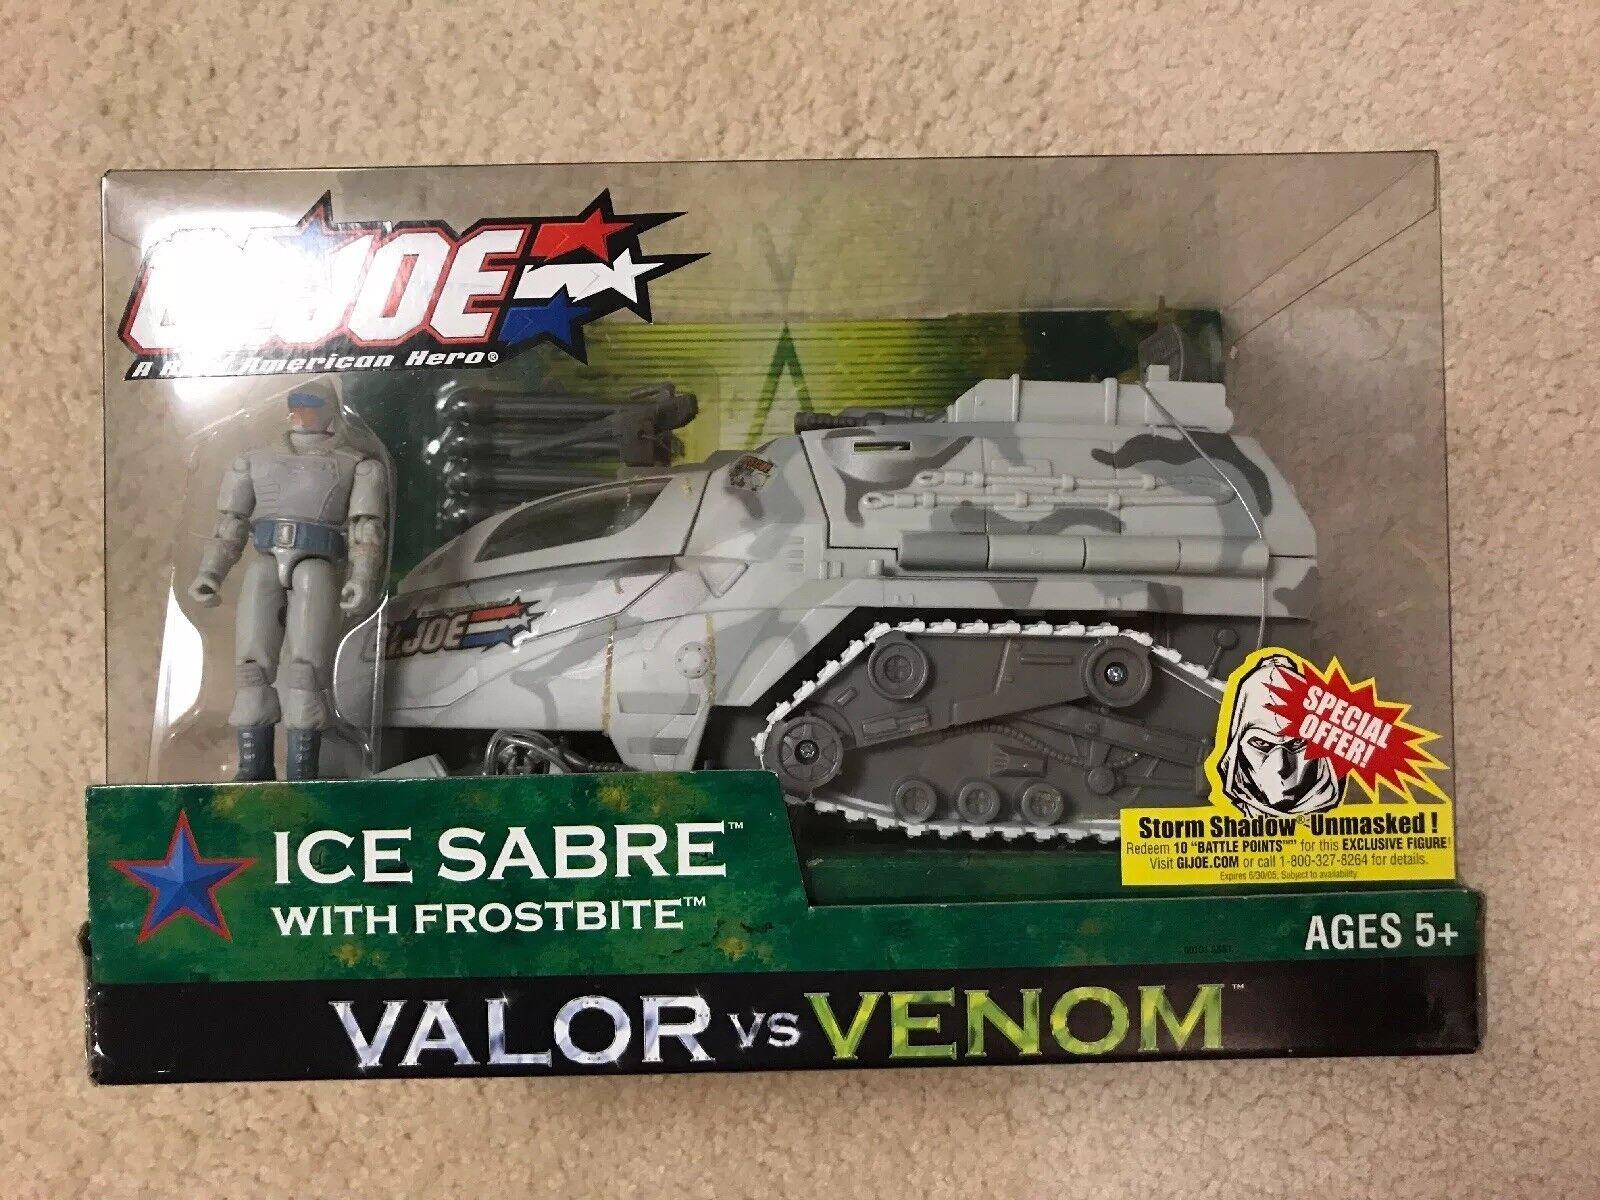 G.I. Joe GIJOE Valor vs Venom Ice Sabre Vehicle with Frostbite NIB Hasbro 2004